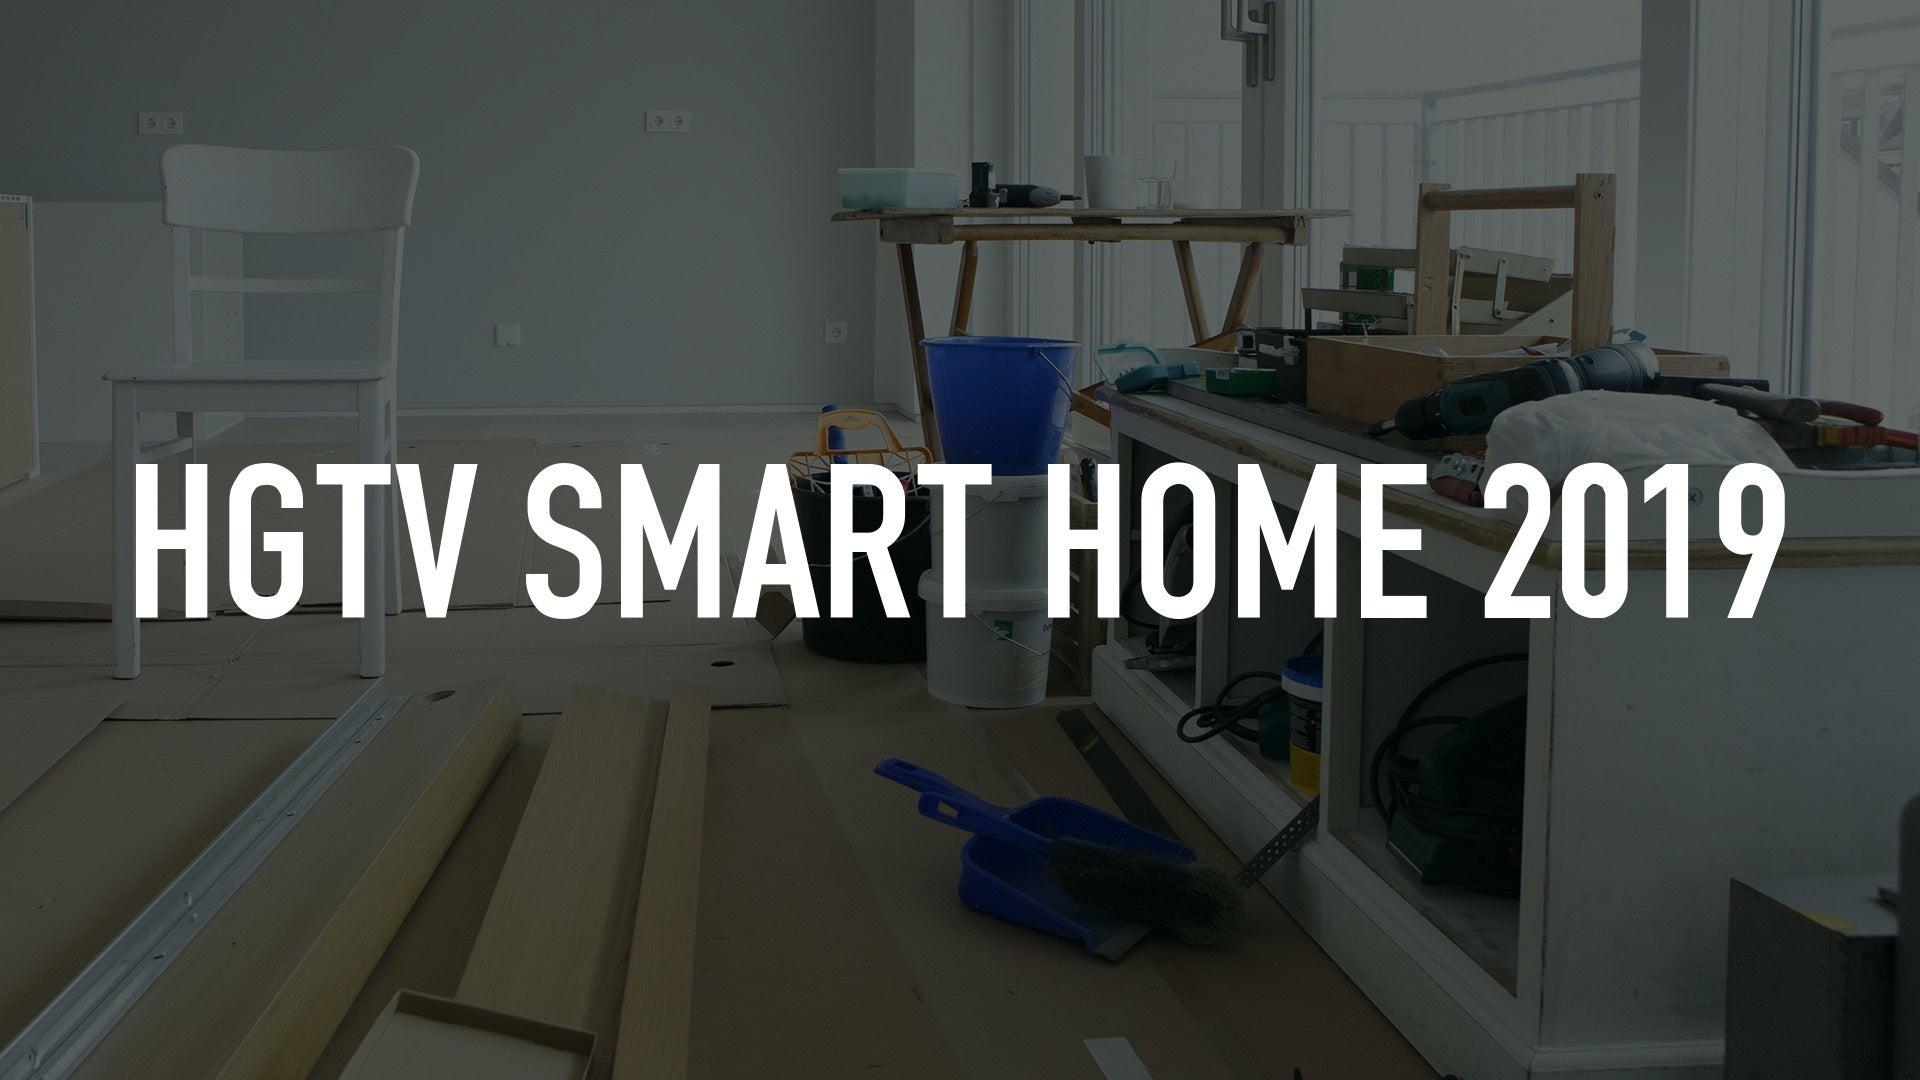 HGTV Smart Home 2019